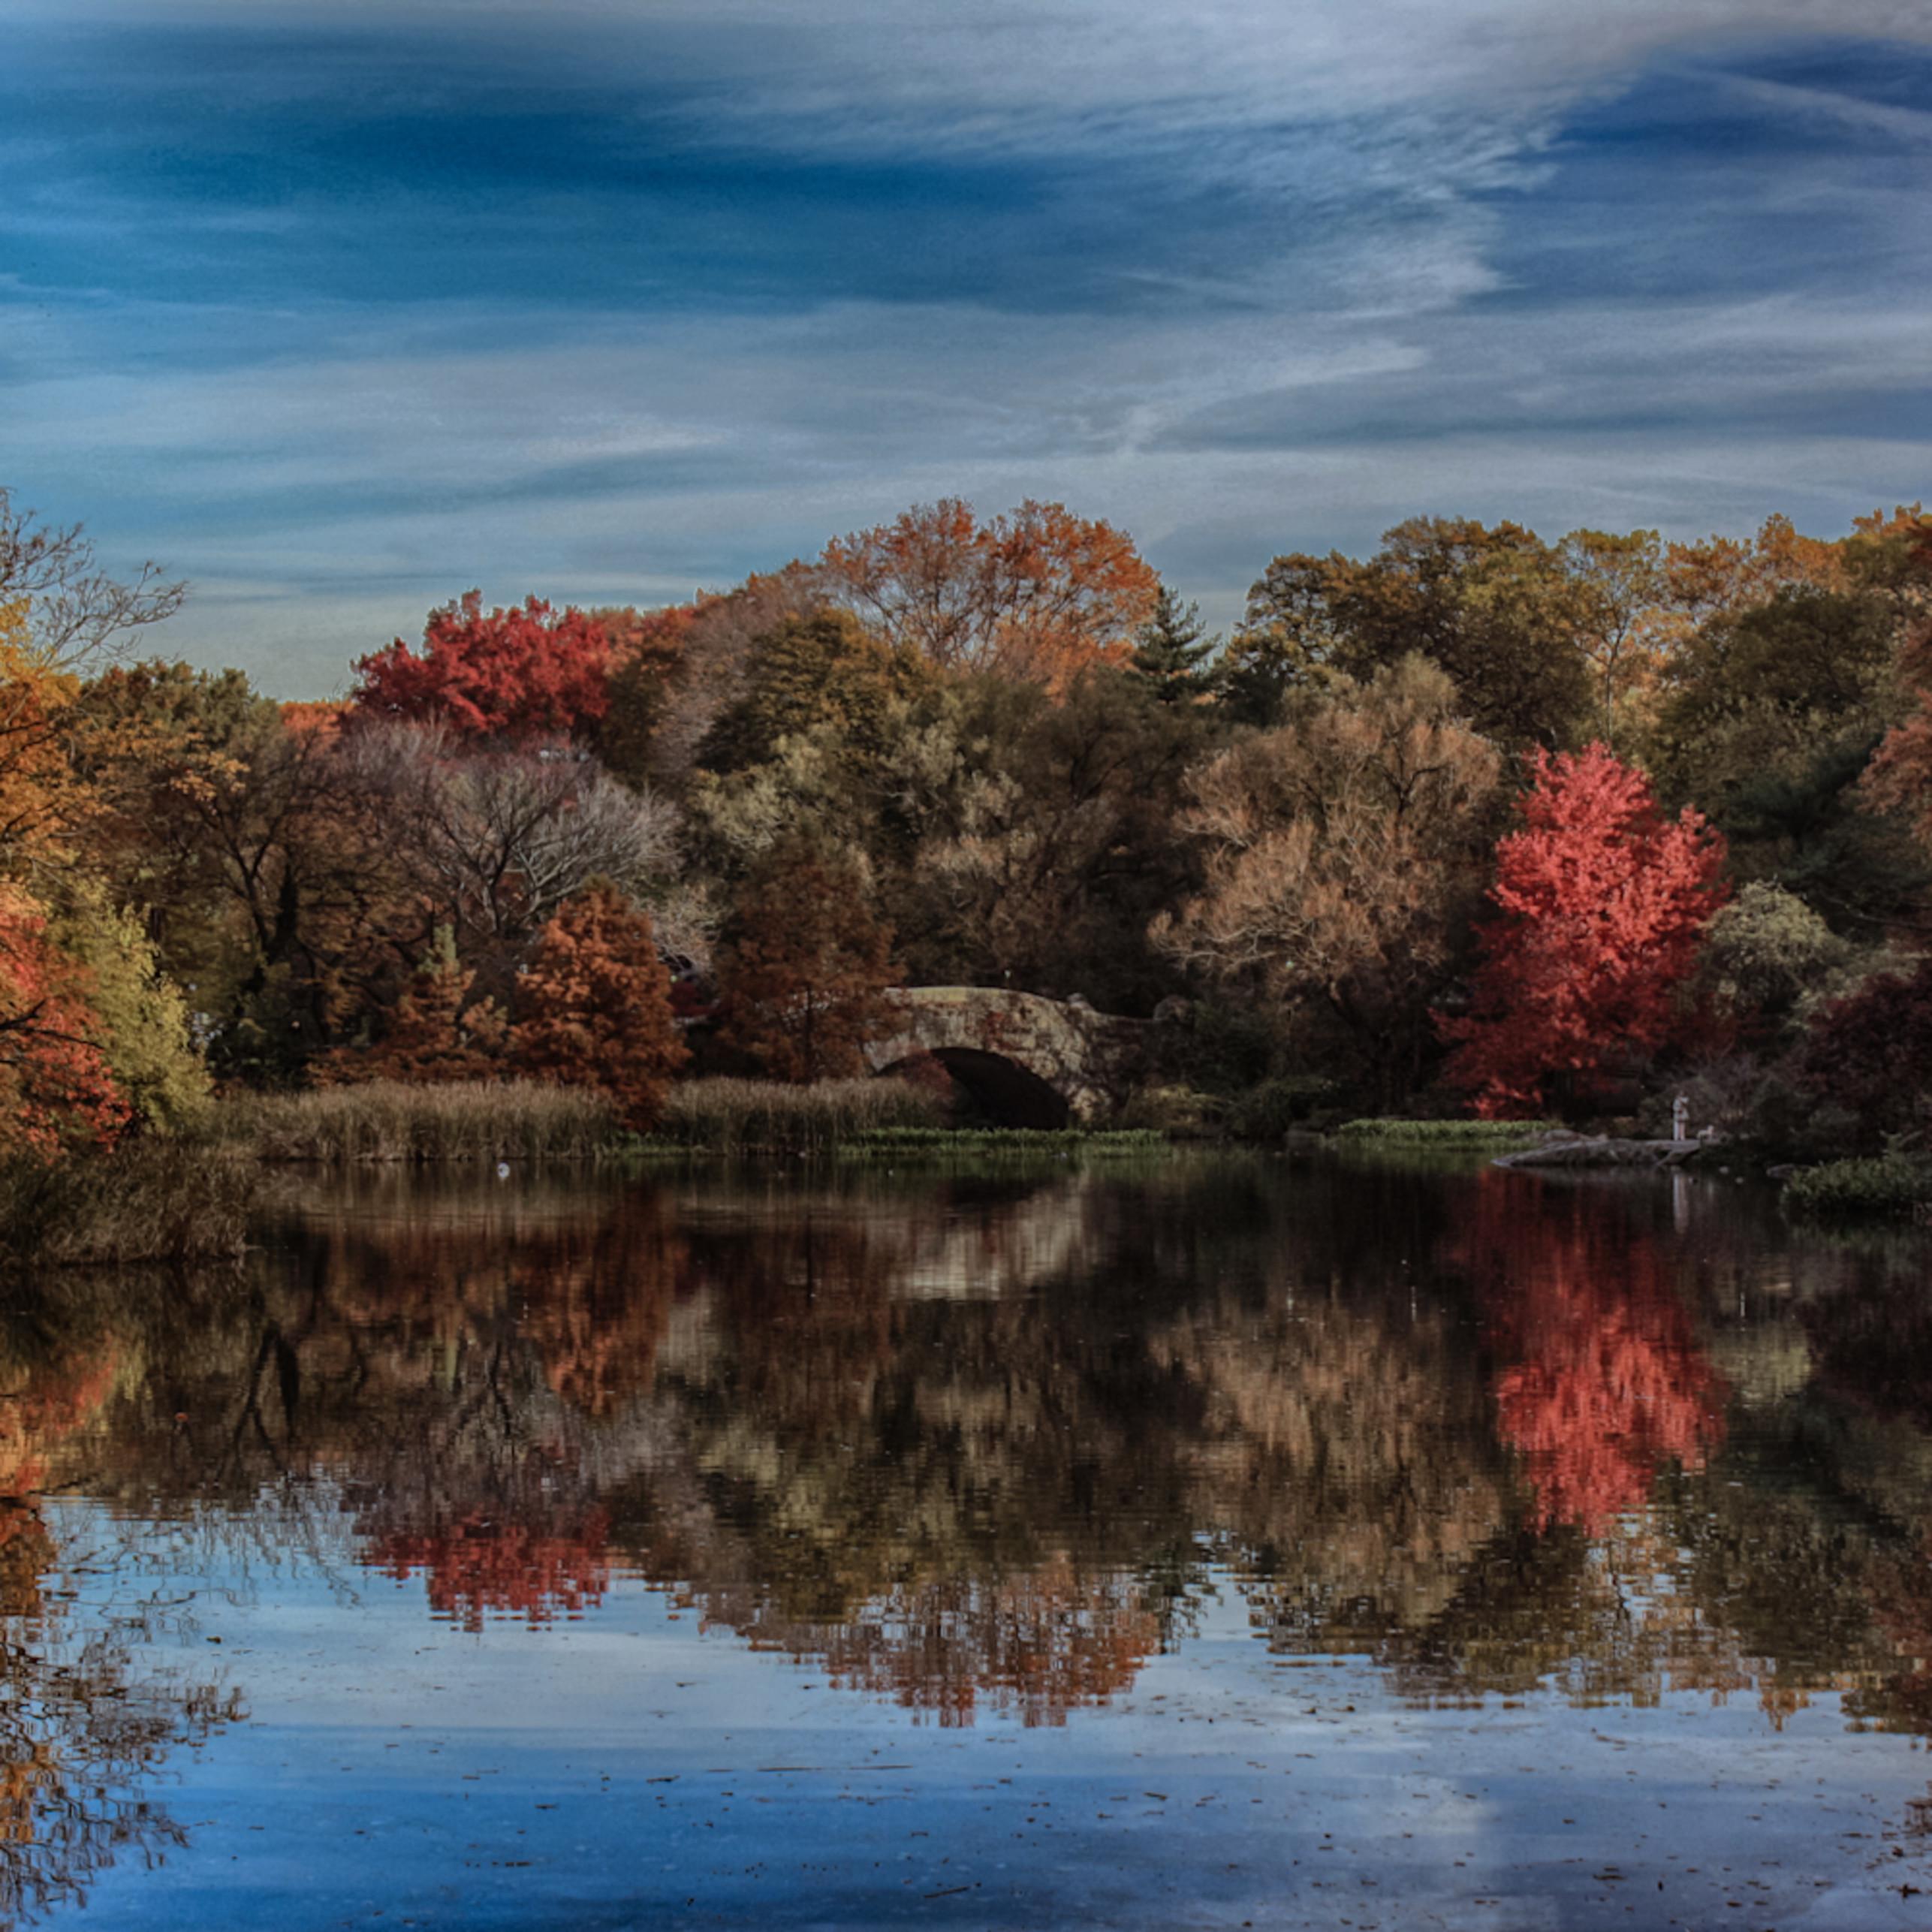 Autumn at the gapstow bridge ngmdhn